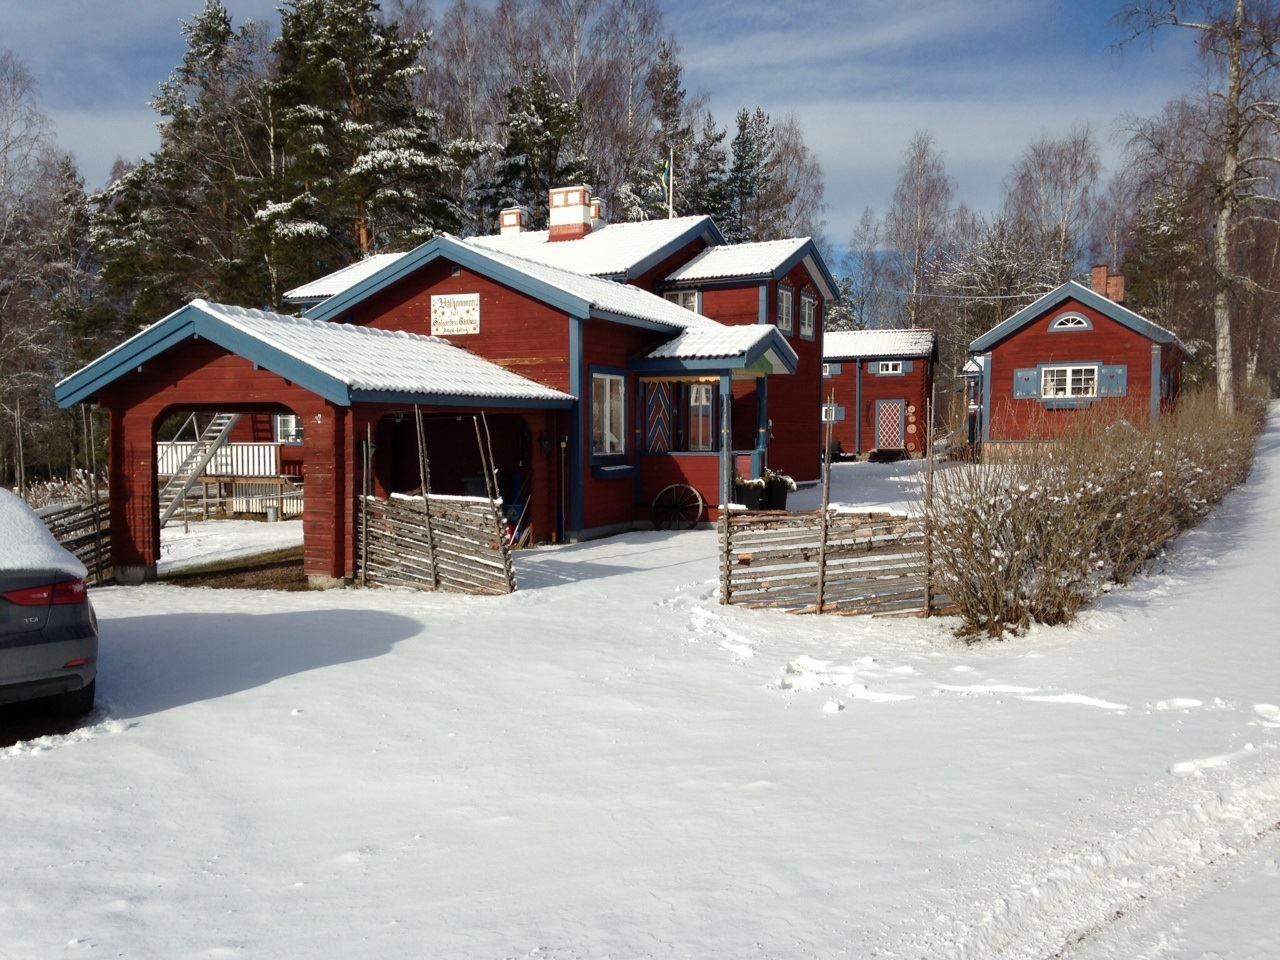 Solgårdskrogen B&B, Nittsjö Rättvik